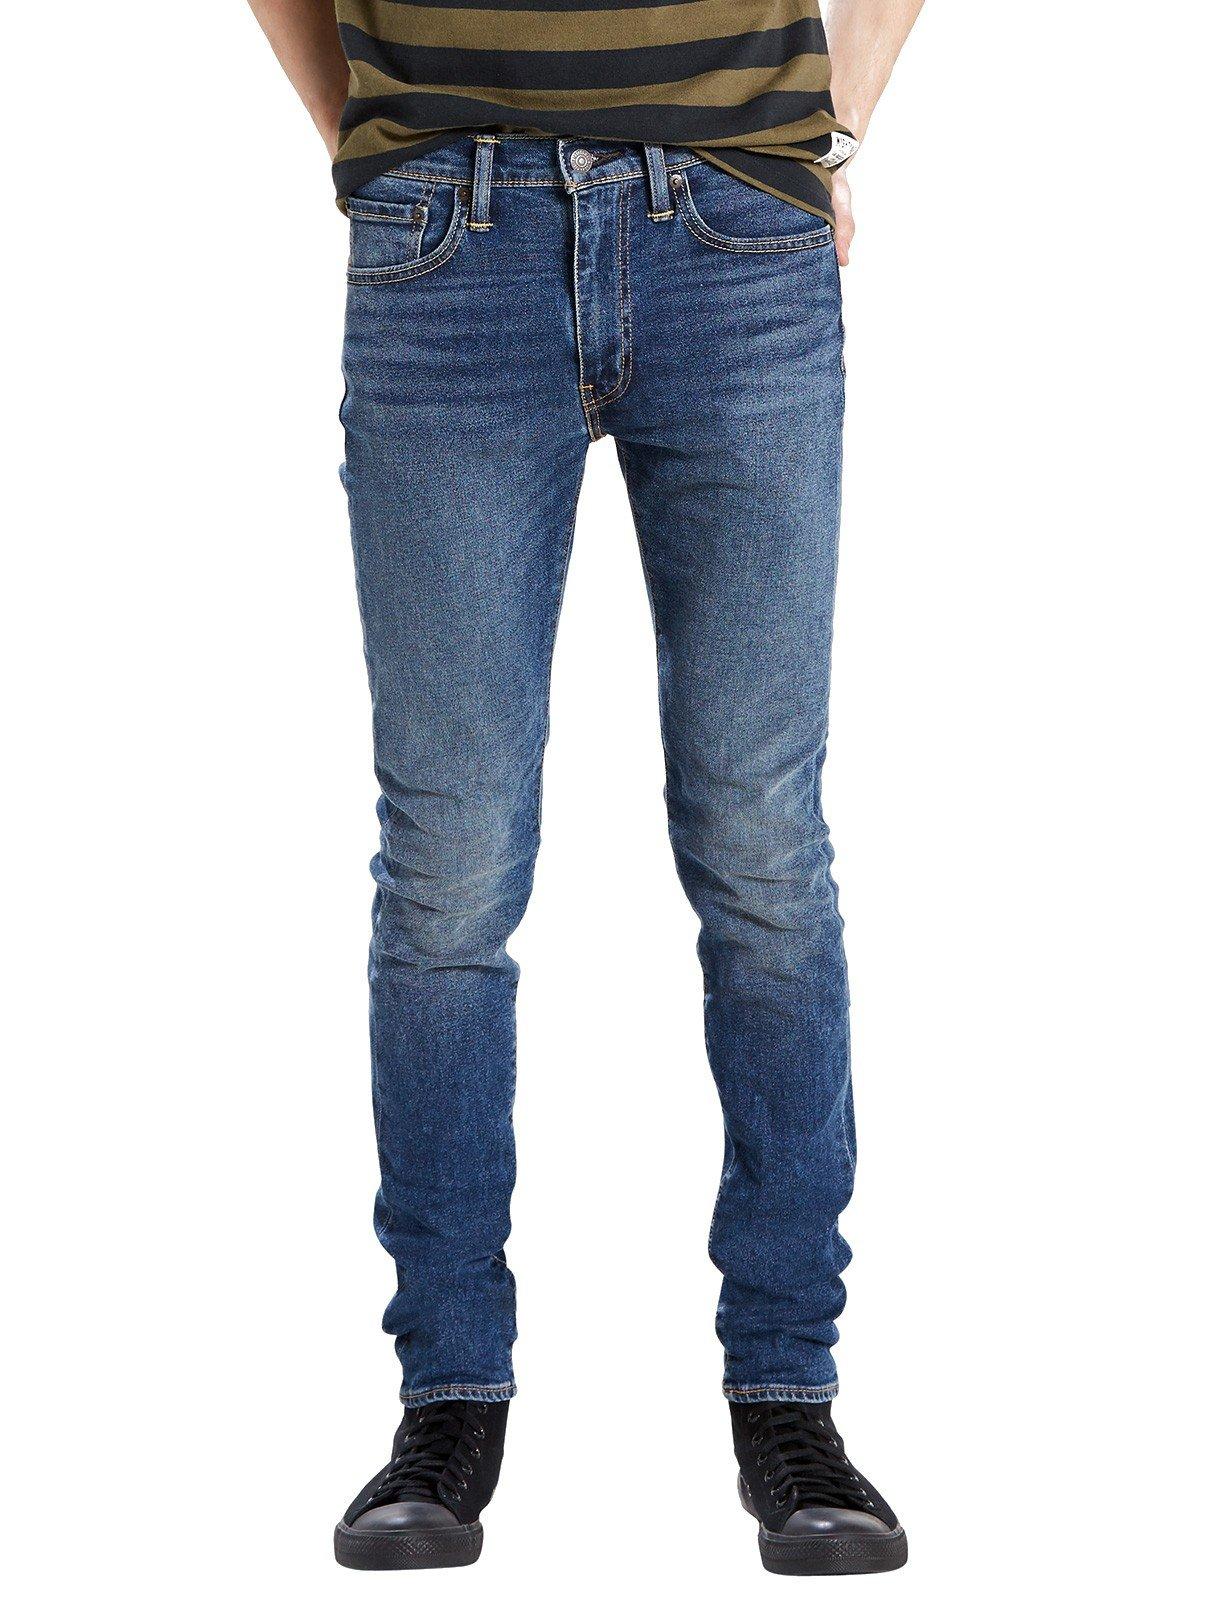 Levi's Men's 519 Extreme Skinny Fit Jeans, Blue, 31W x 30L